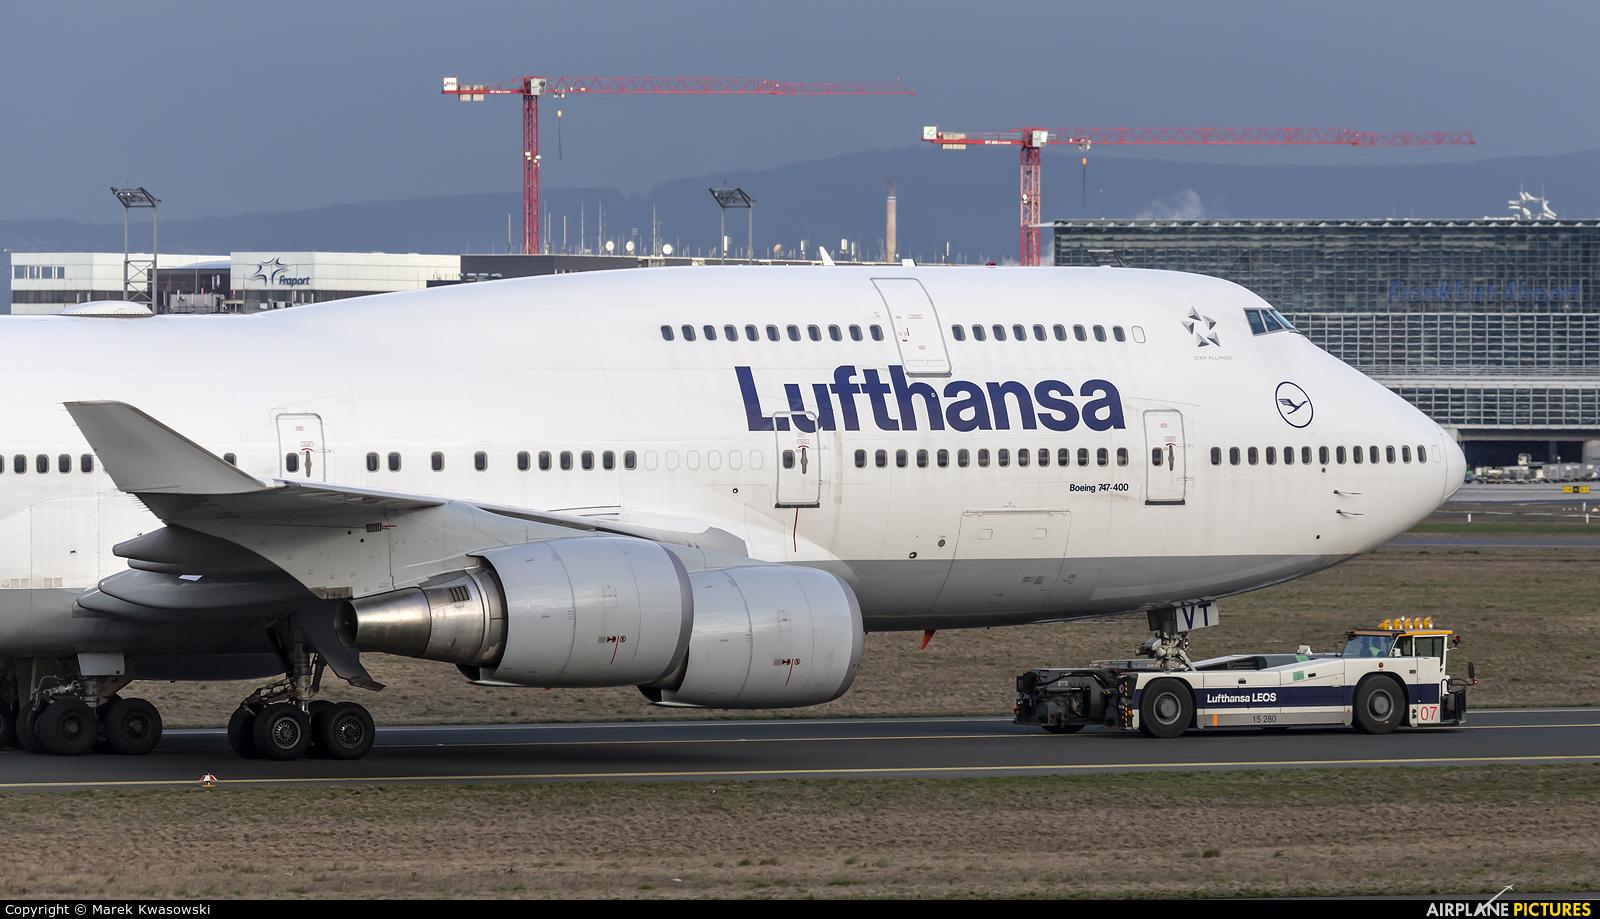 Lufthansa D-ABVT aircraft at Frankfurt